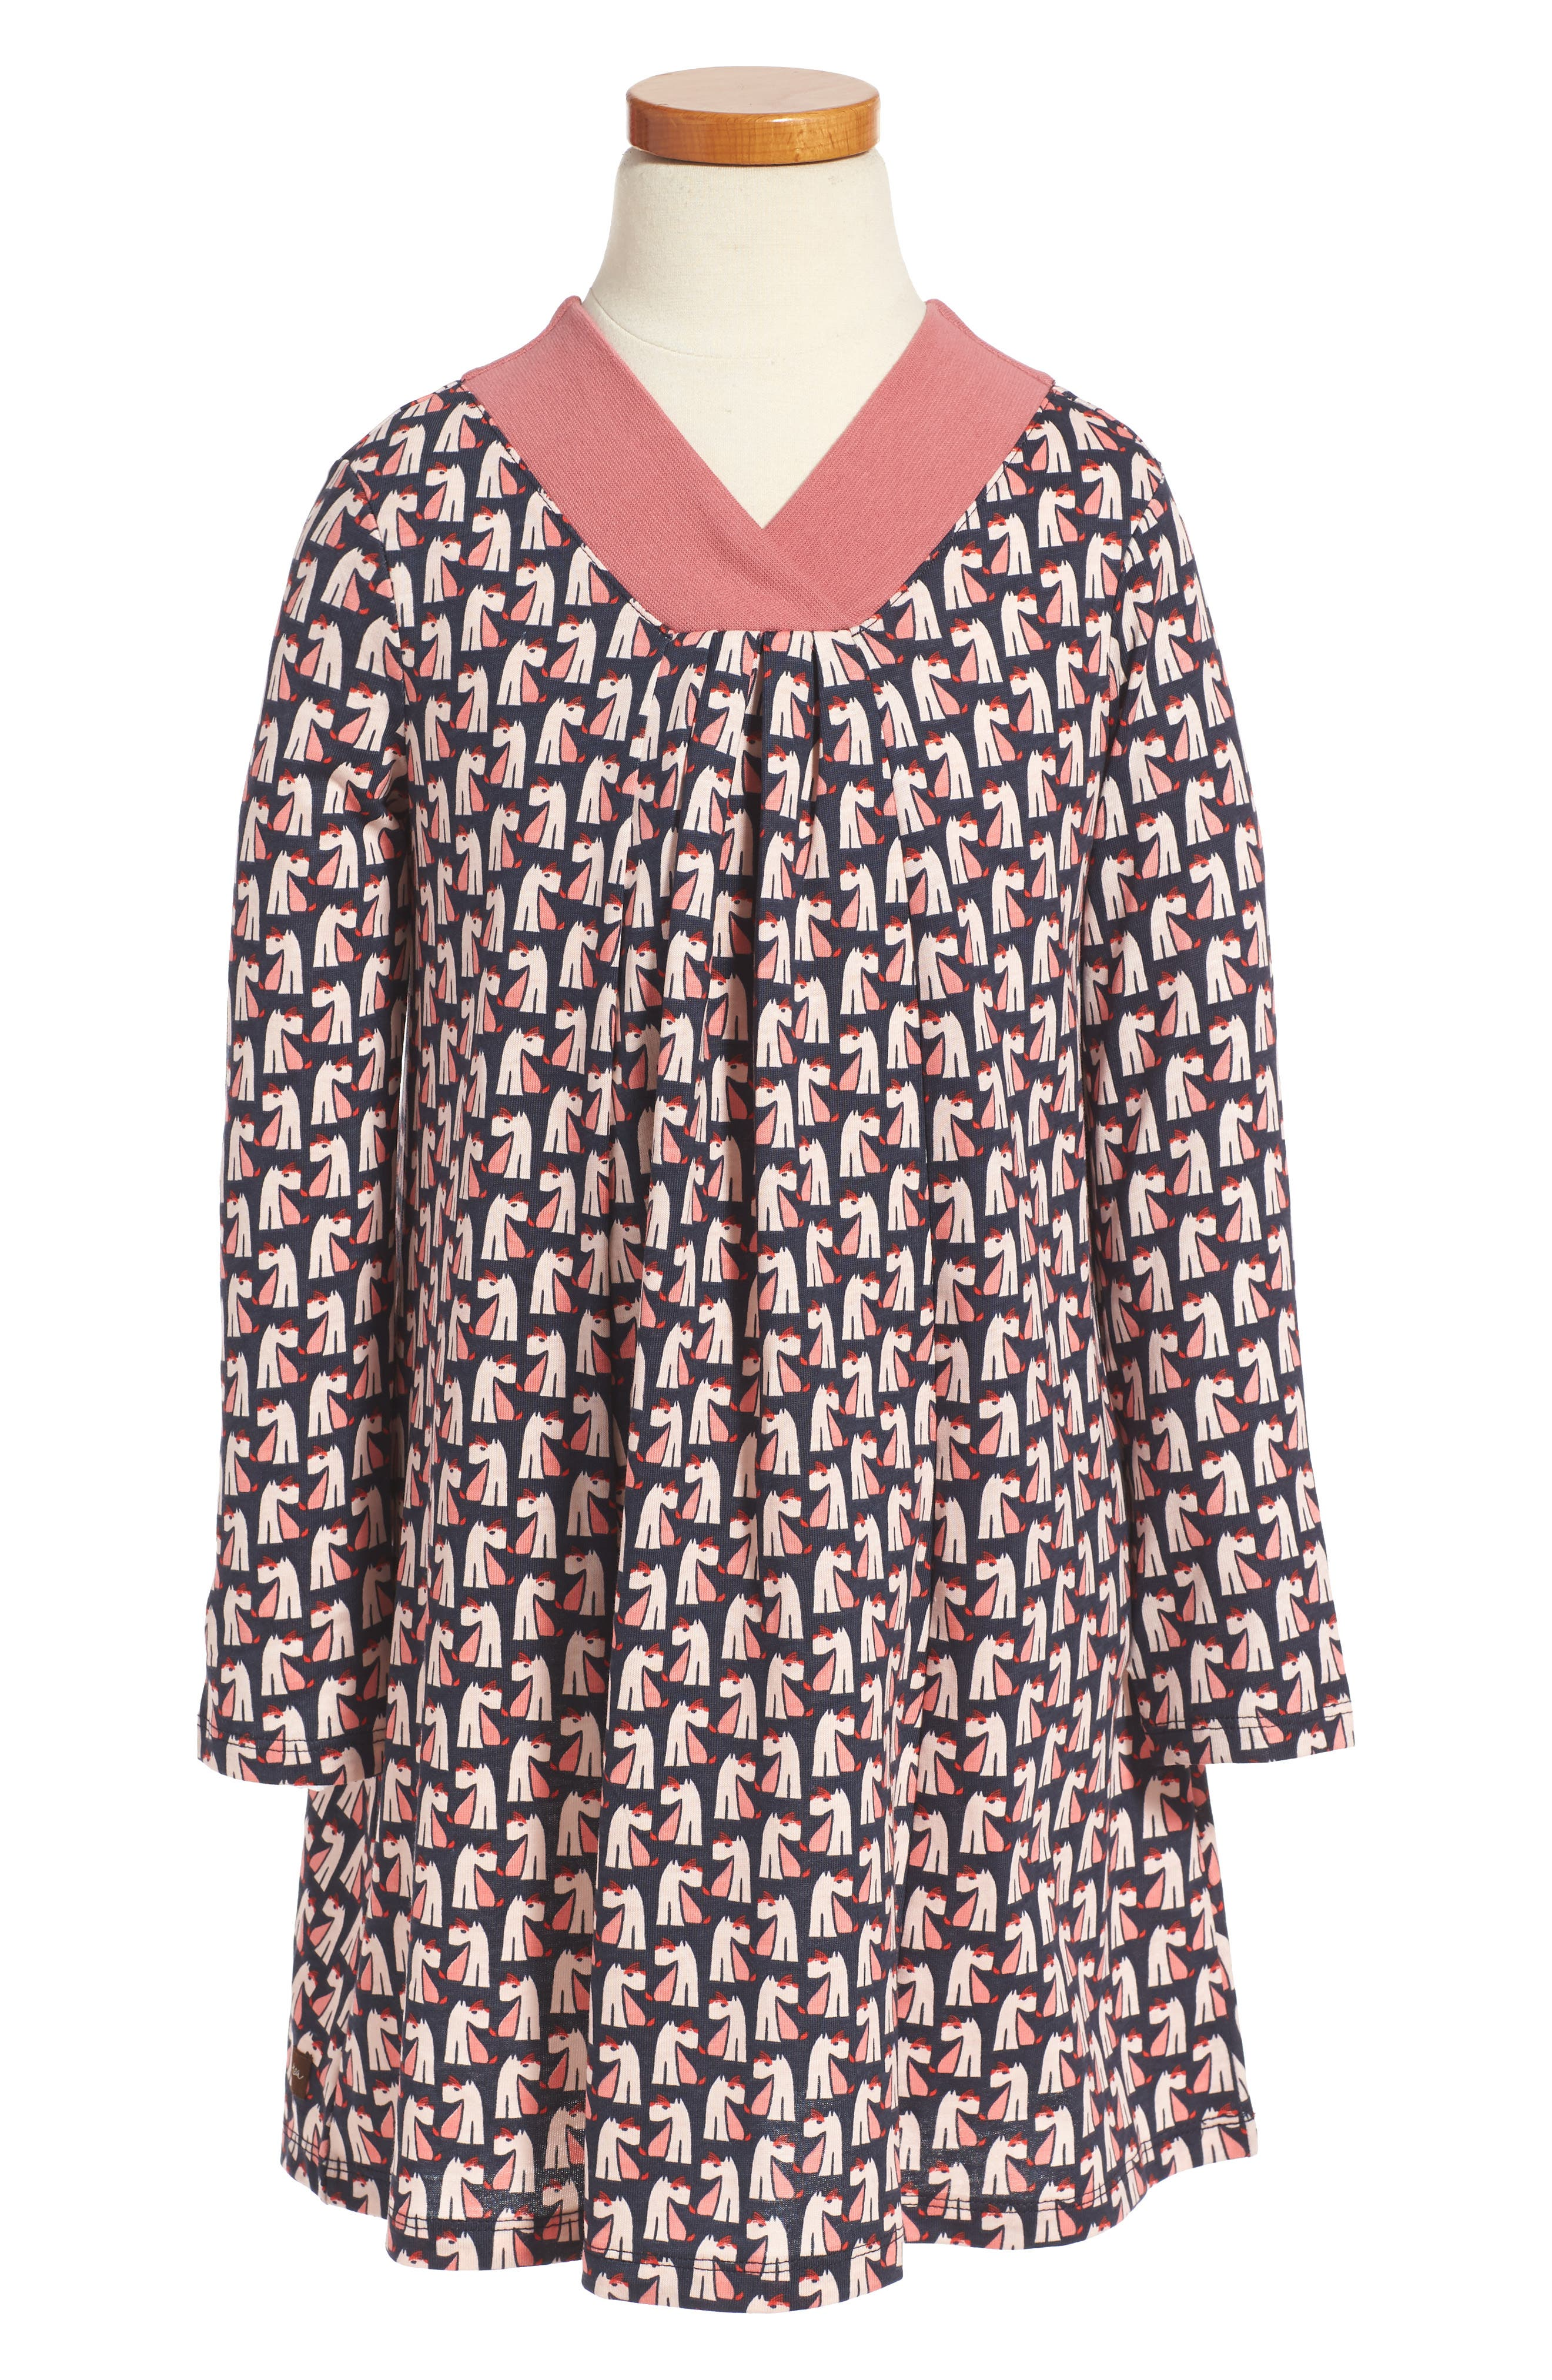 Alternate Image 1 Selected - Tea Collection Scottie Dog Pleated Trapeze Dress (Toddler Girls, Little Girls & Big Girls)